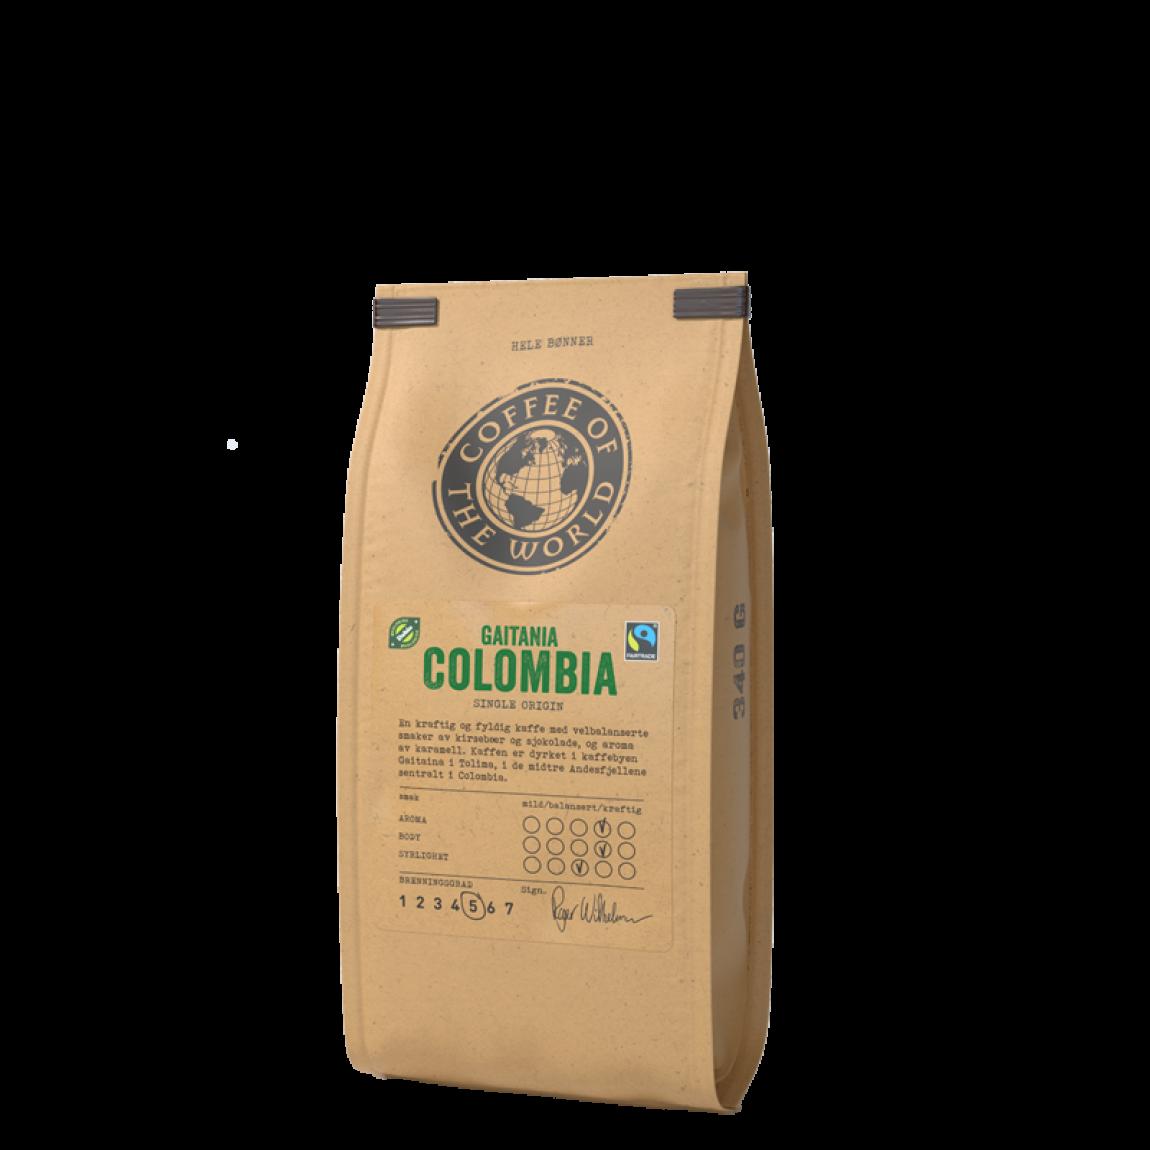 kaffe helebønner Gaitania Colombia